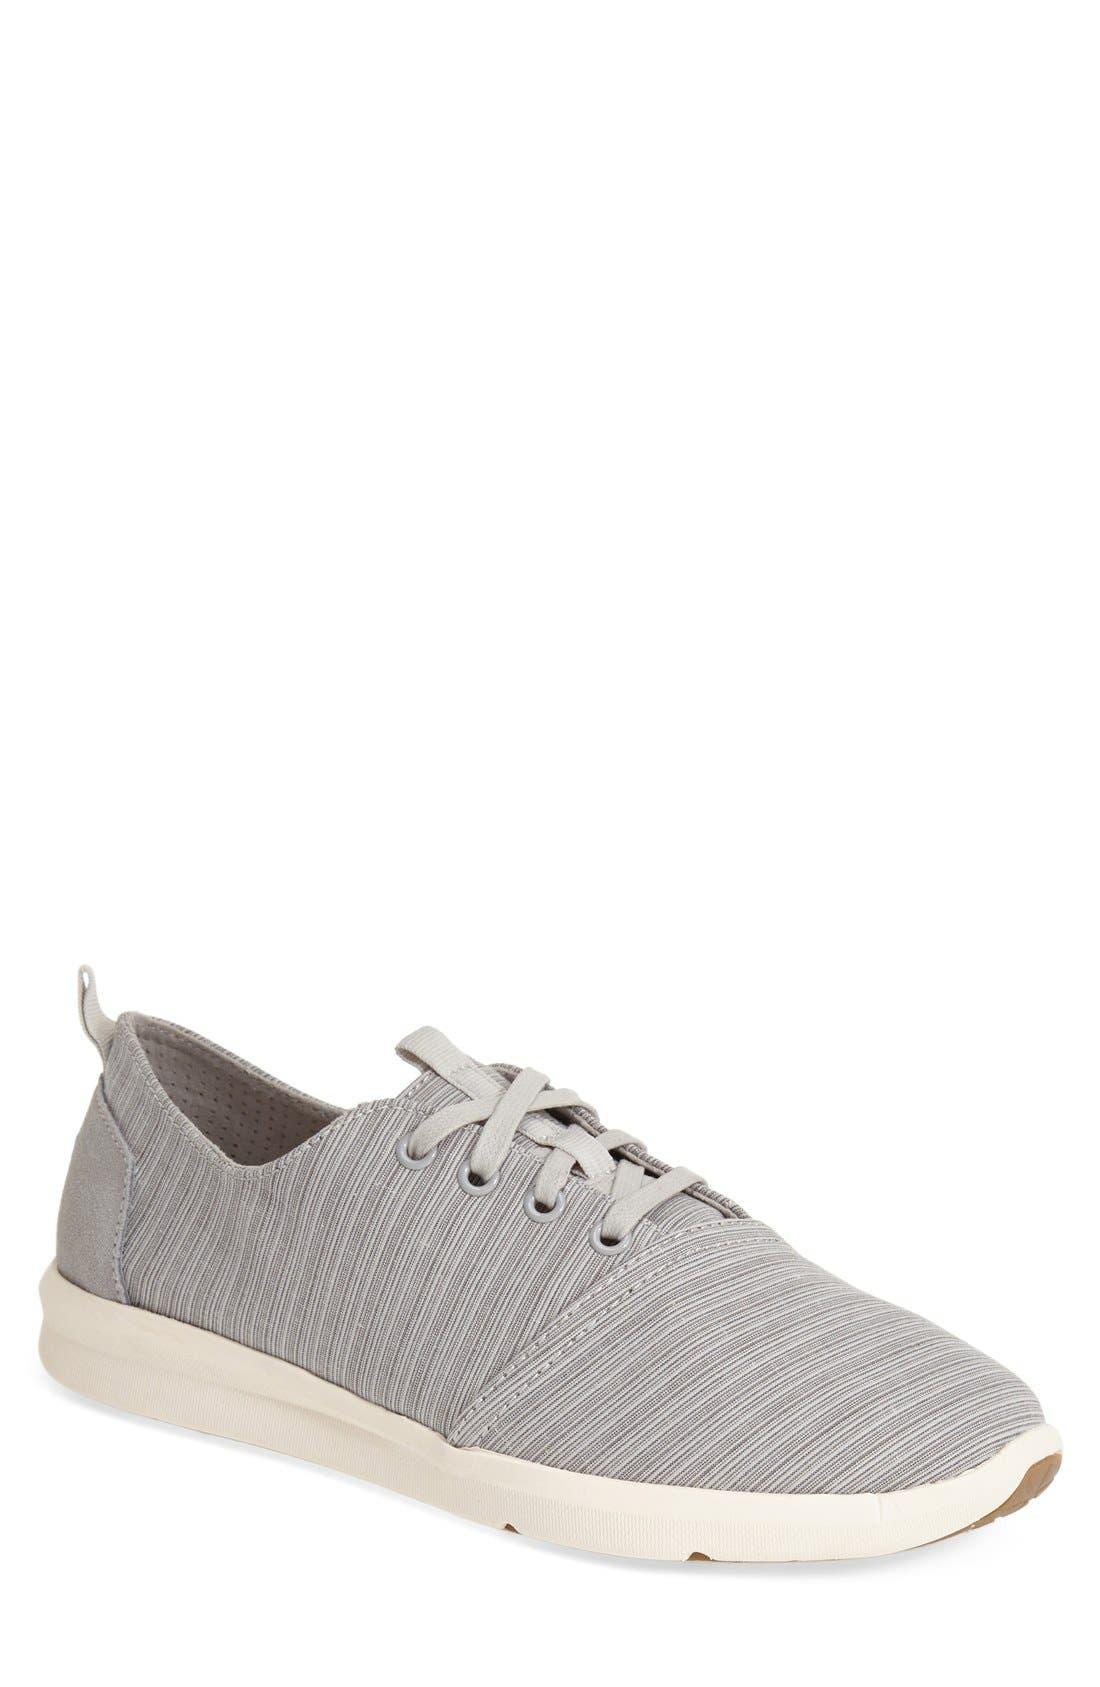 Main Image - TOMS 'Viaje' Sneaker (Men)